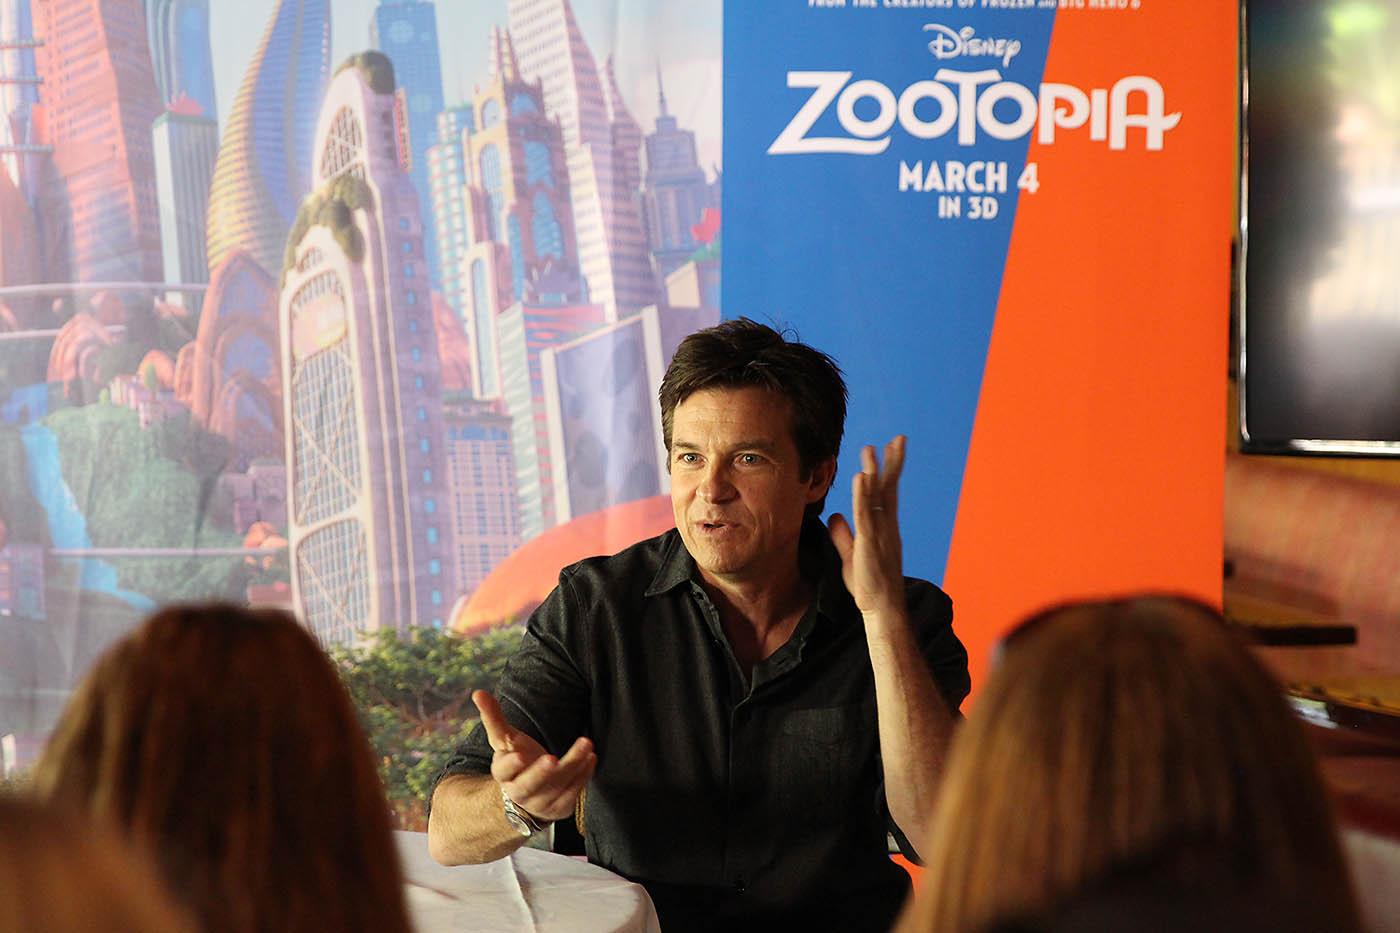 Jason Bateman Zootopia Blogger interview